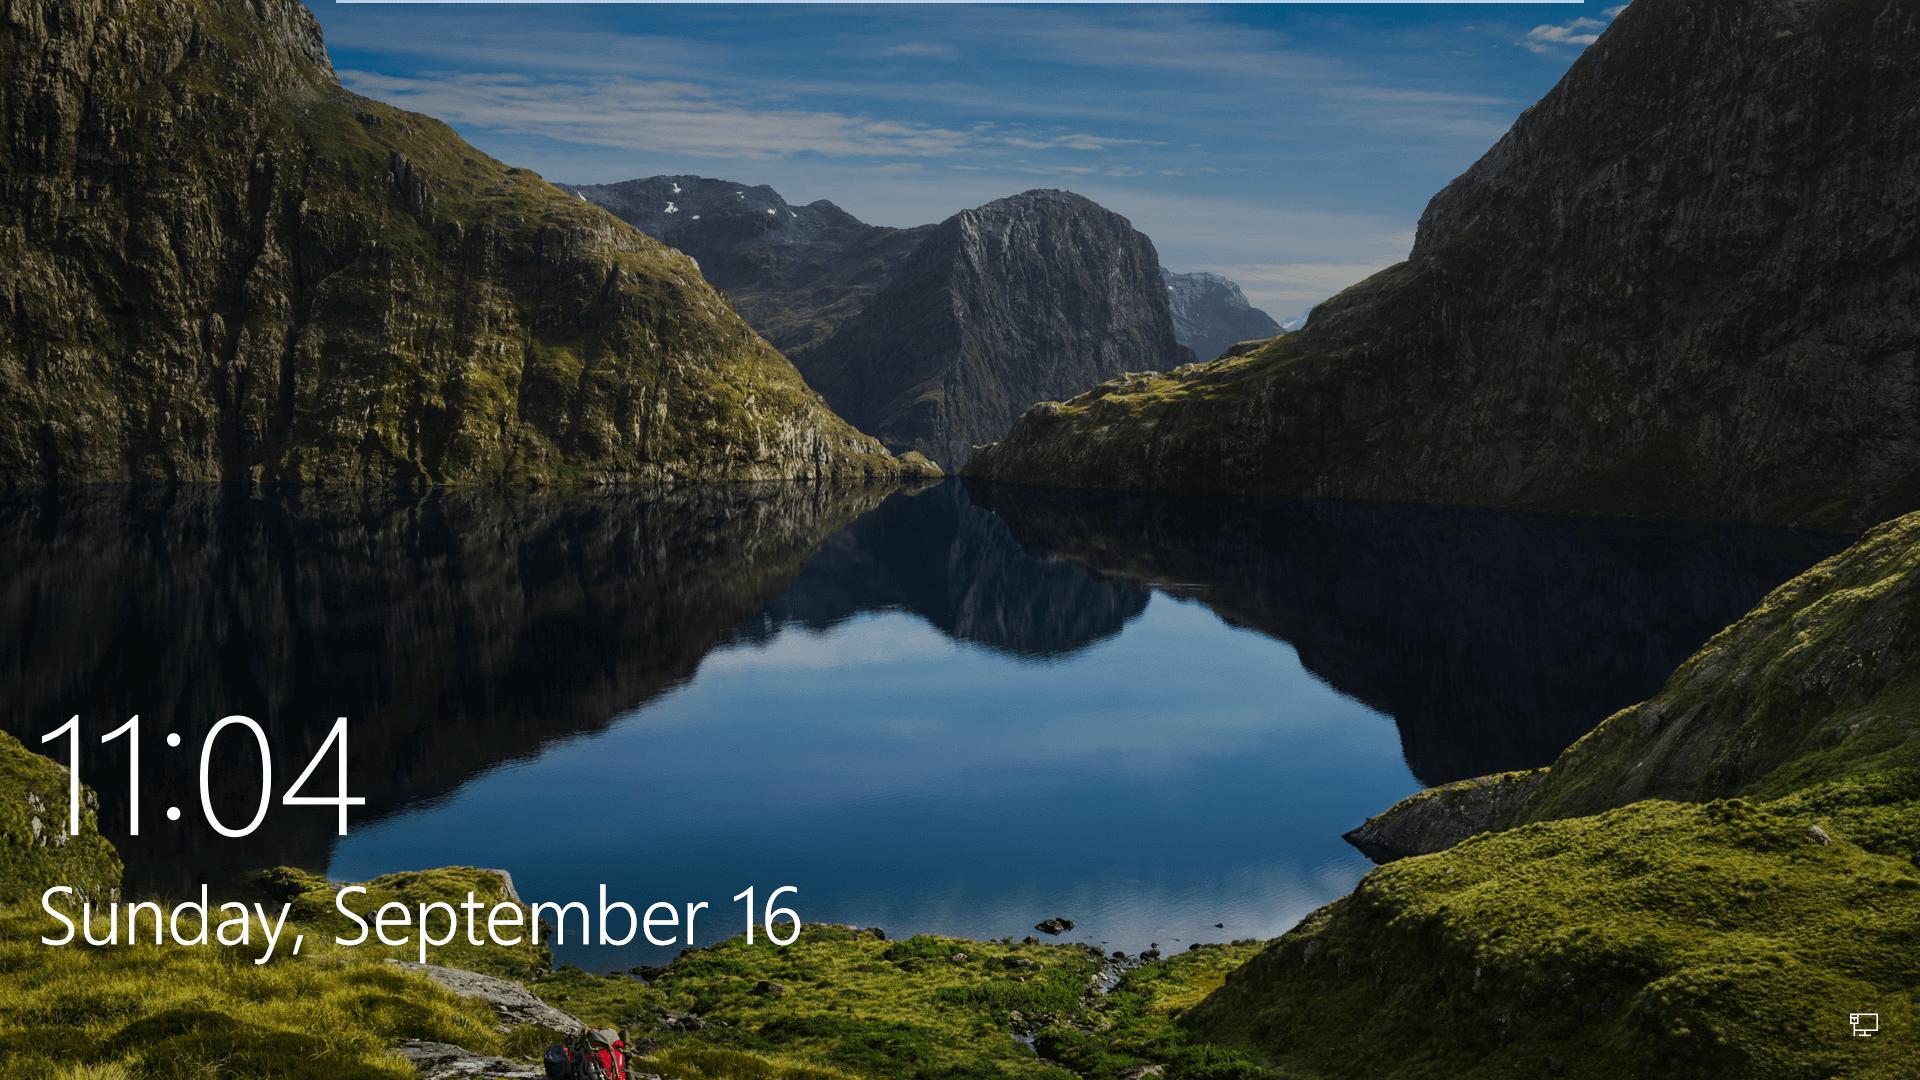 Windows 10 Lock Screen Lake - HD Wallpaper